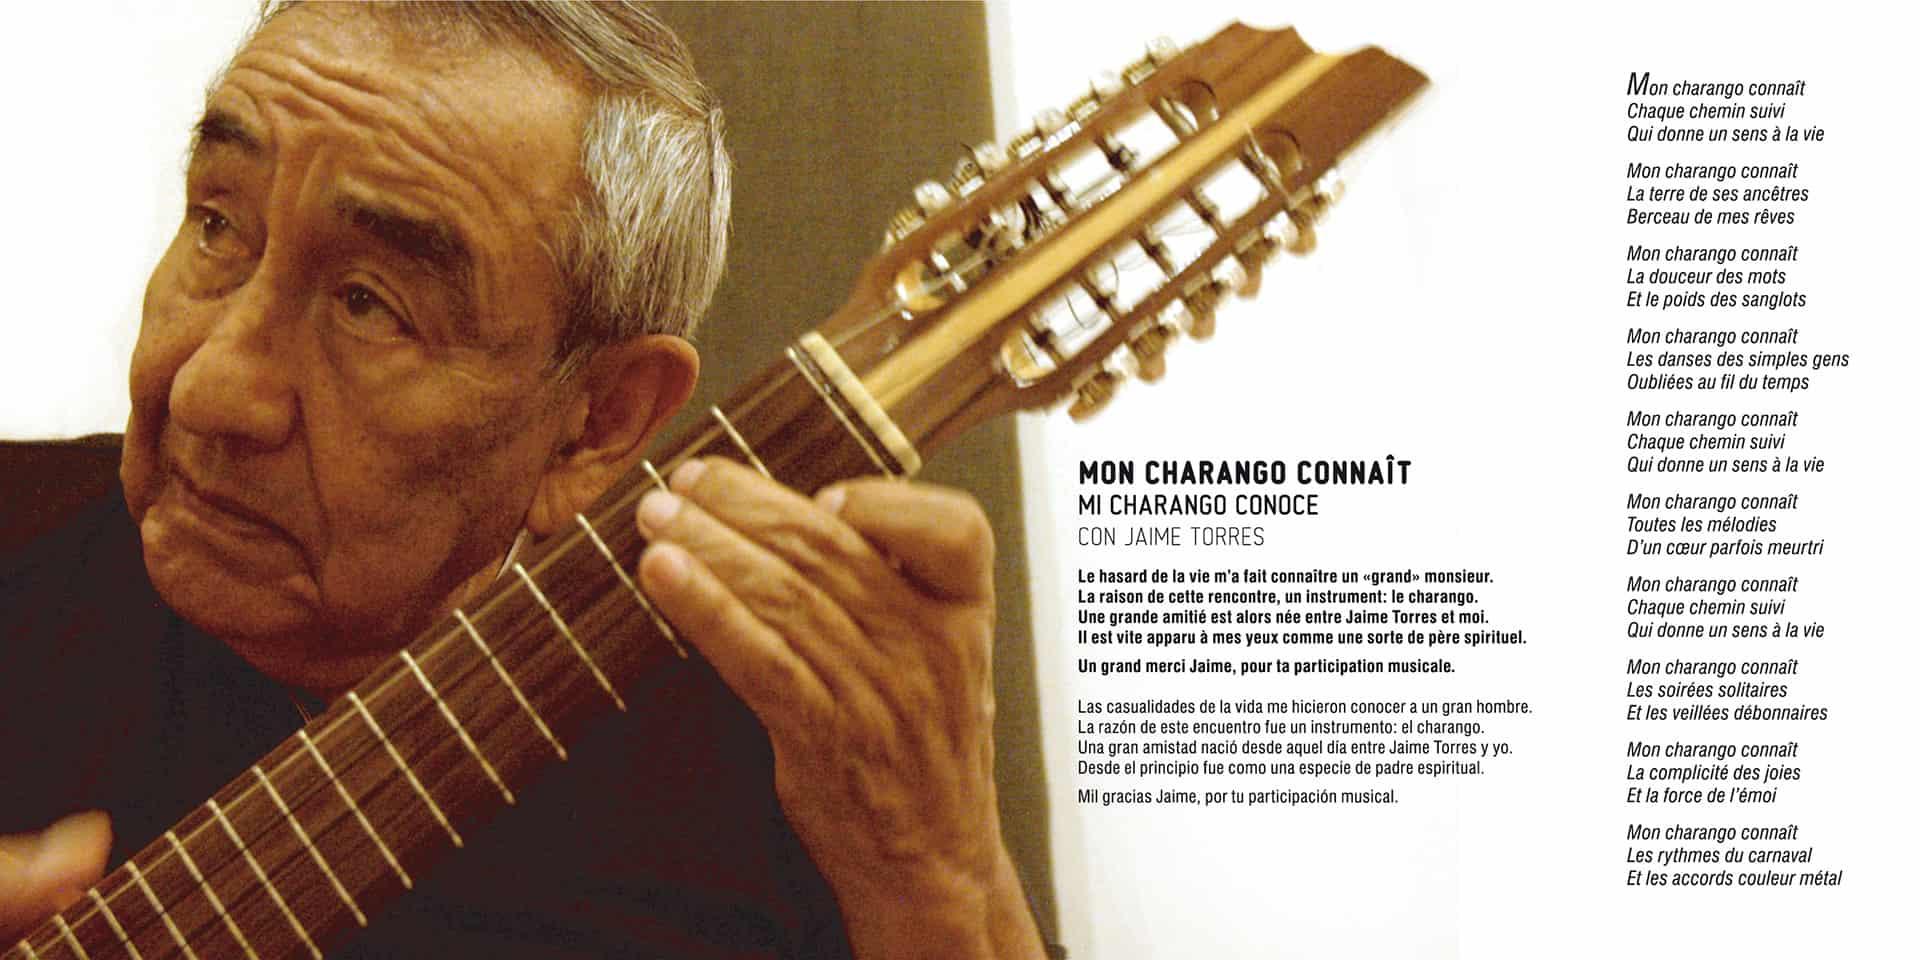 mon-charango-connait-revolucion-charango